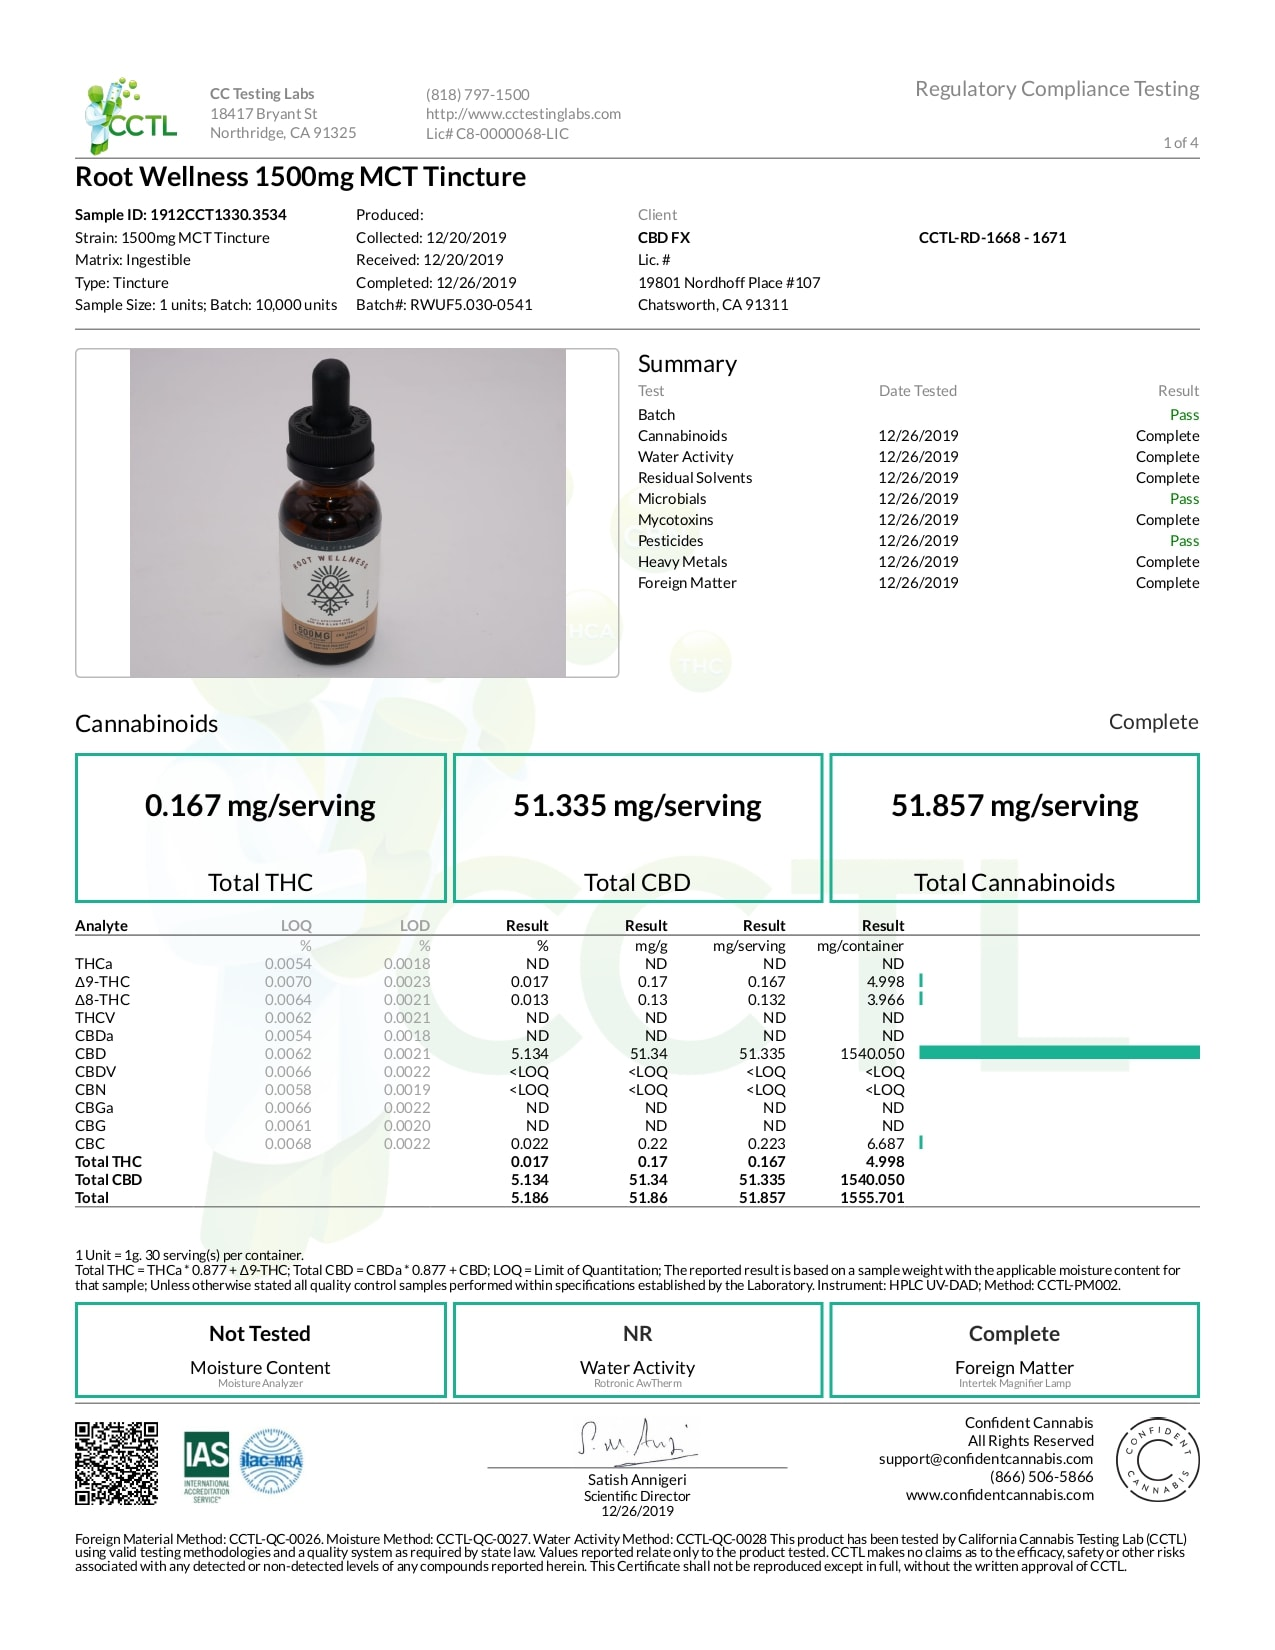 Root Wellness Raw CBD Tincture Lab Report Full Spectrum 1500mg